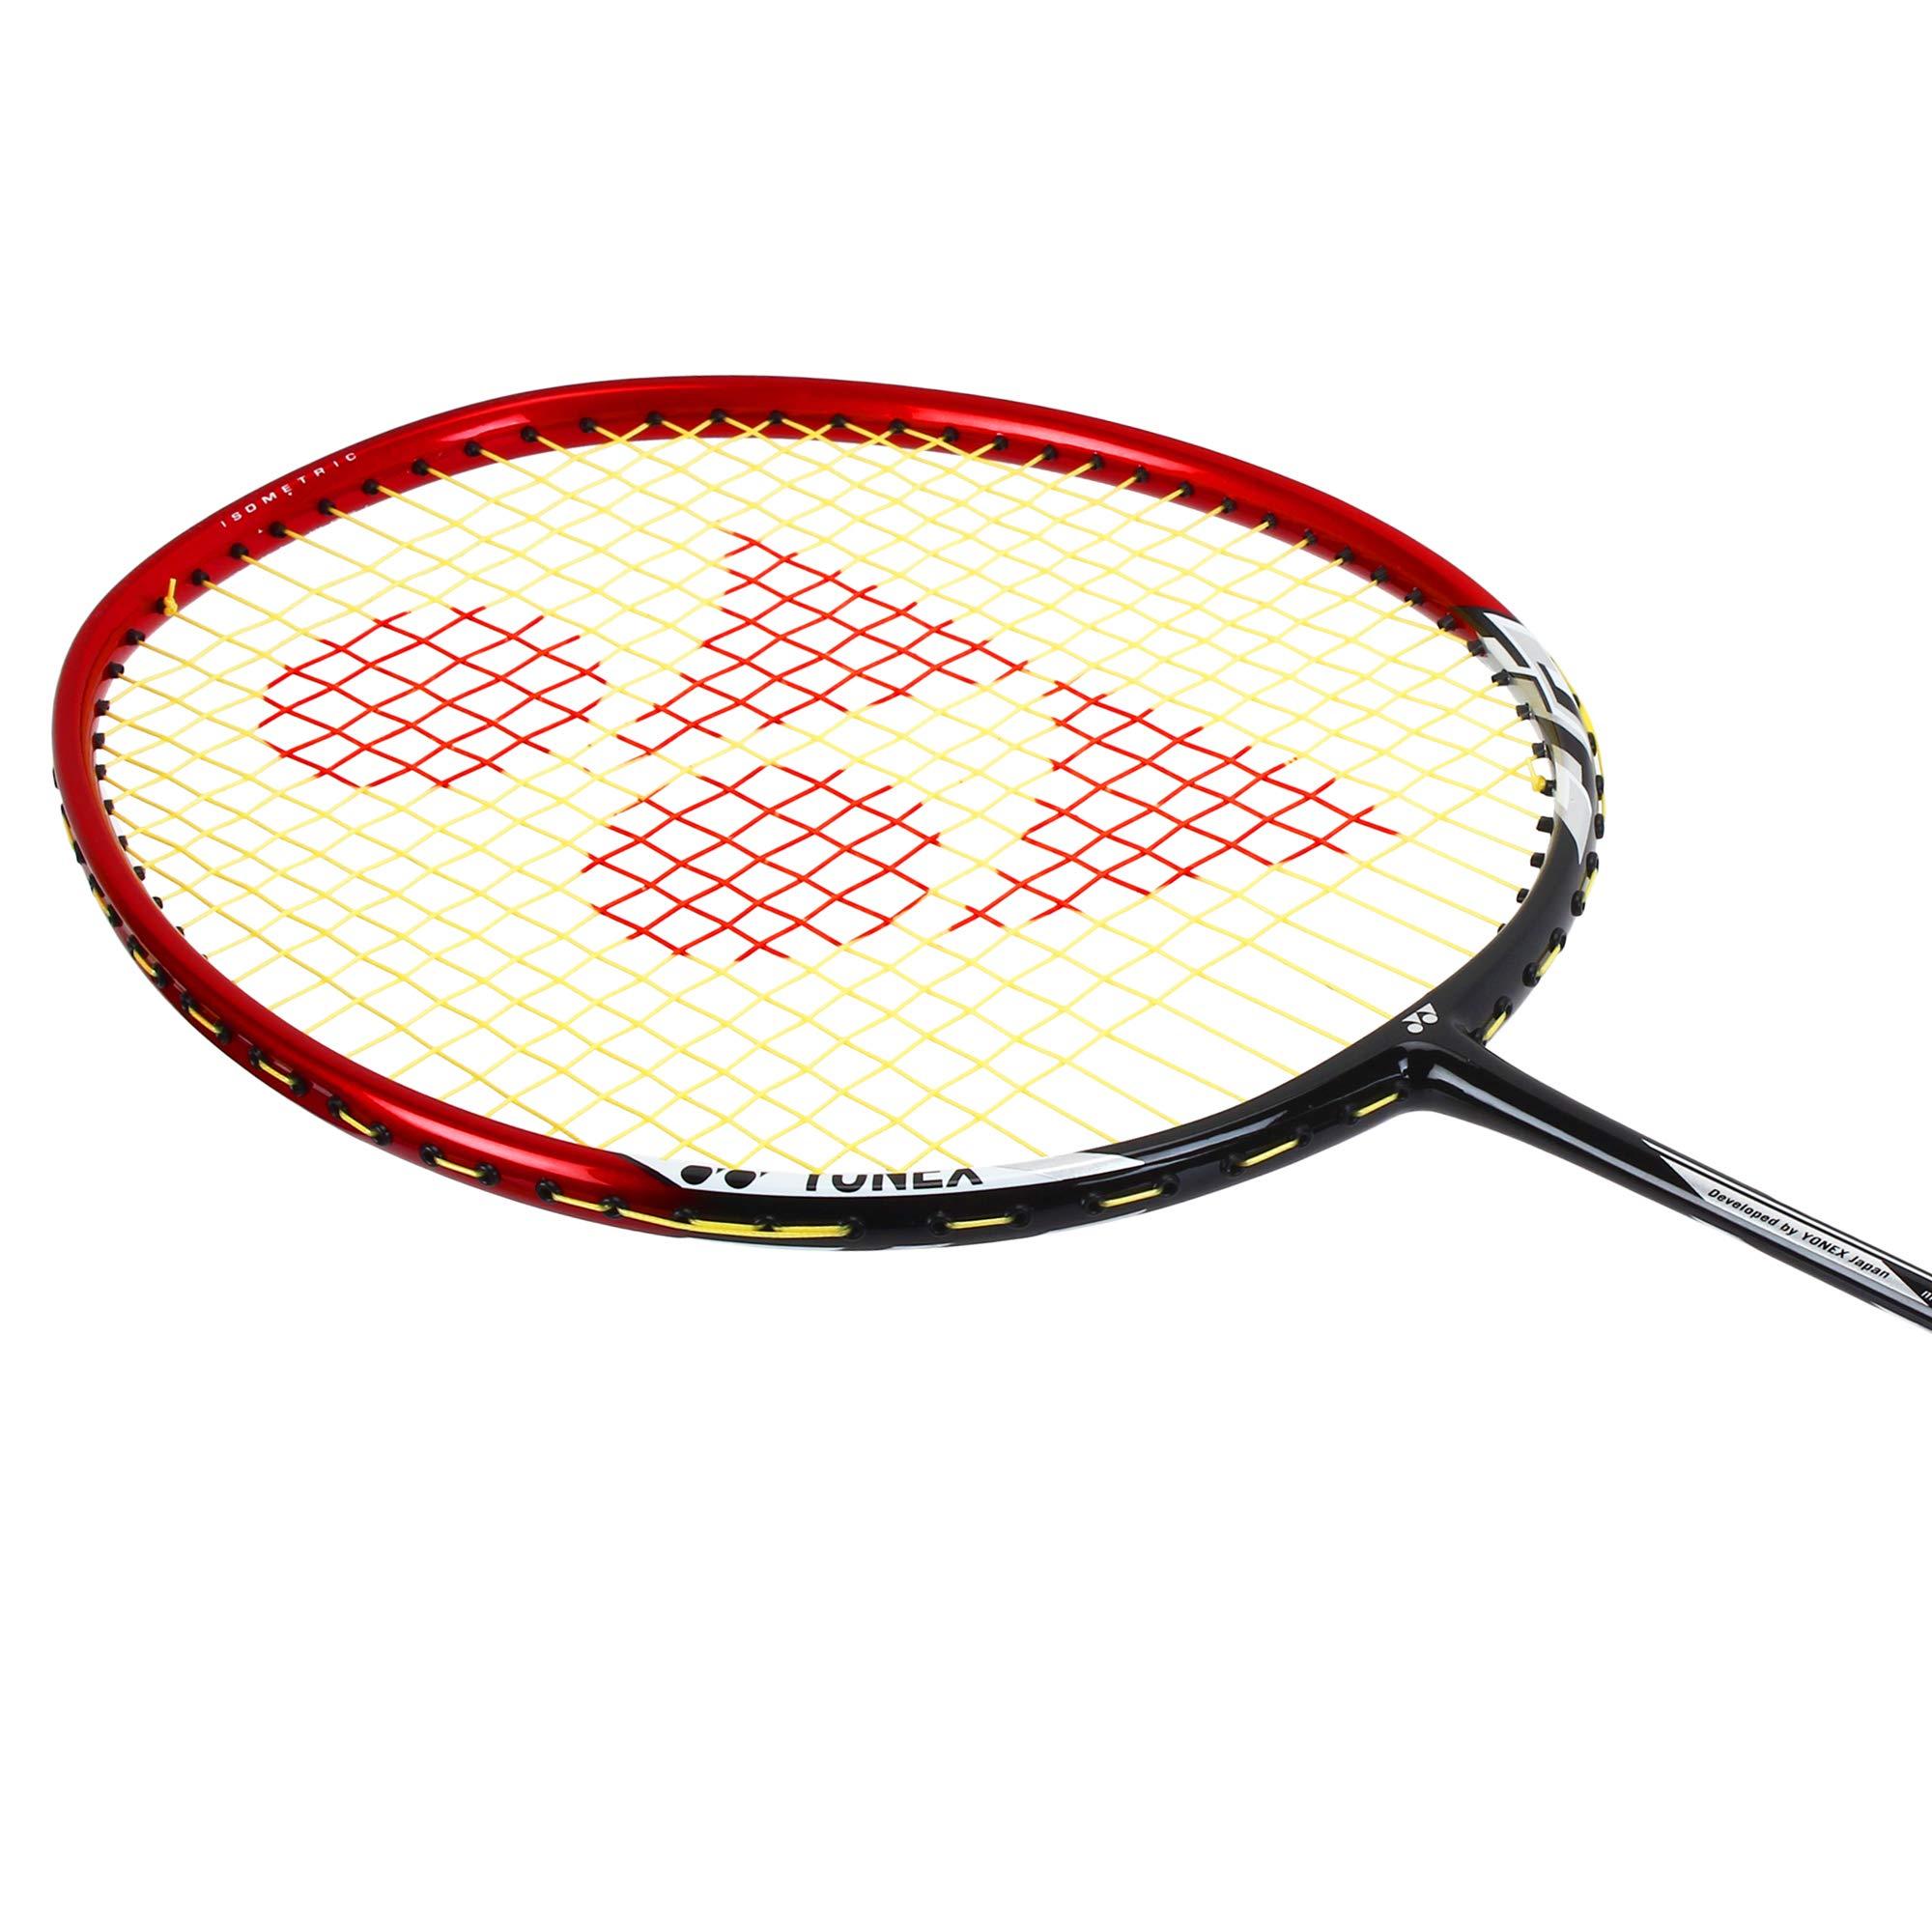 Yonex Nanoray 6000I G4-U Badminton Racquet Red by Yonex (Image #4)